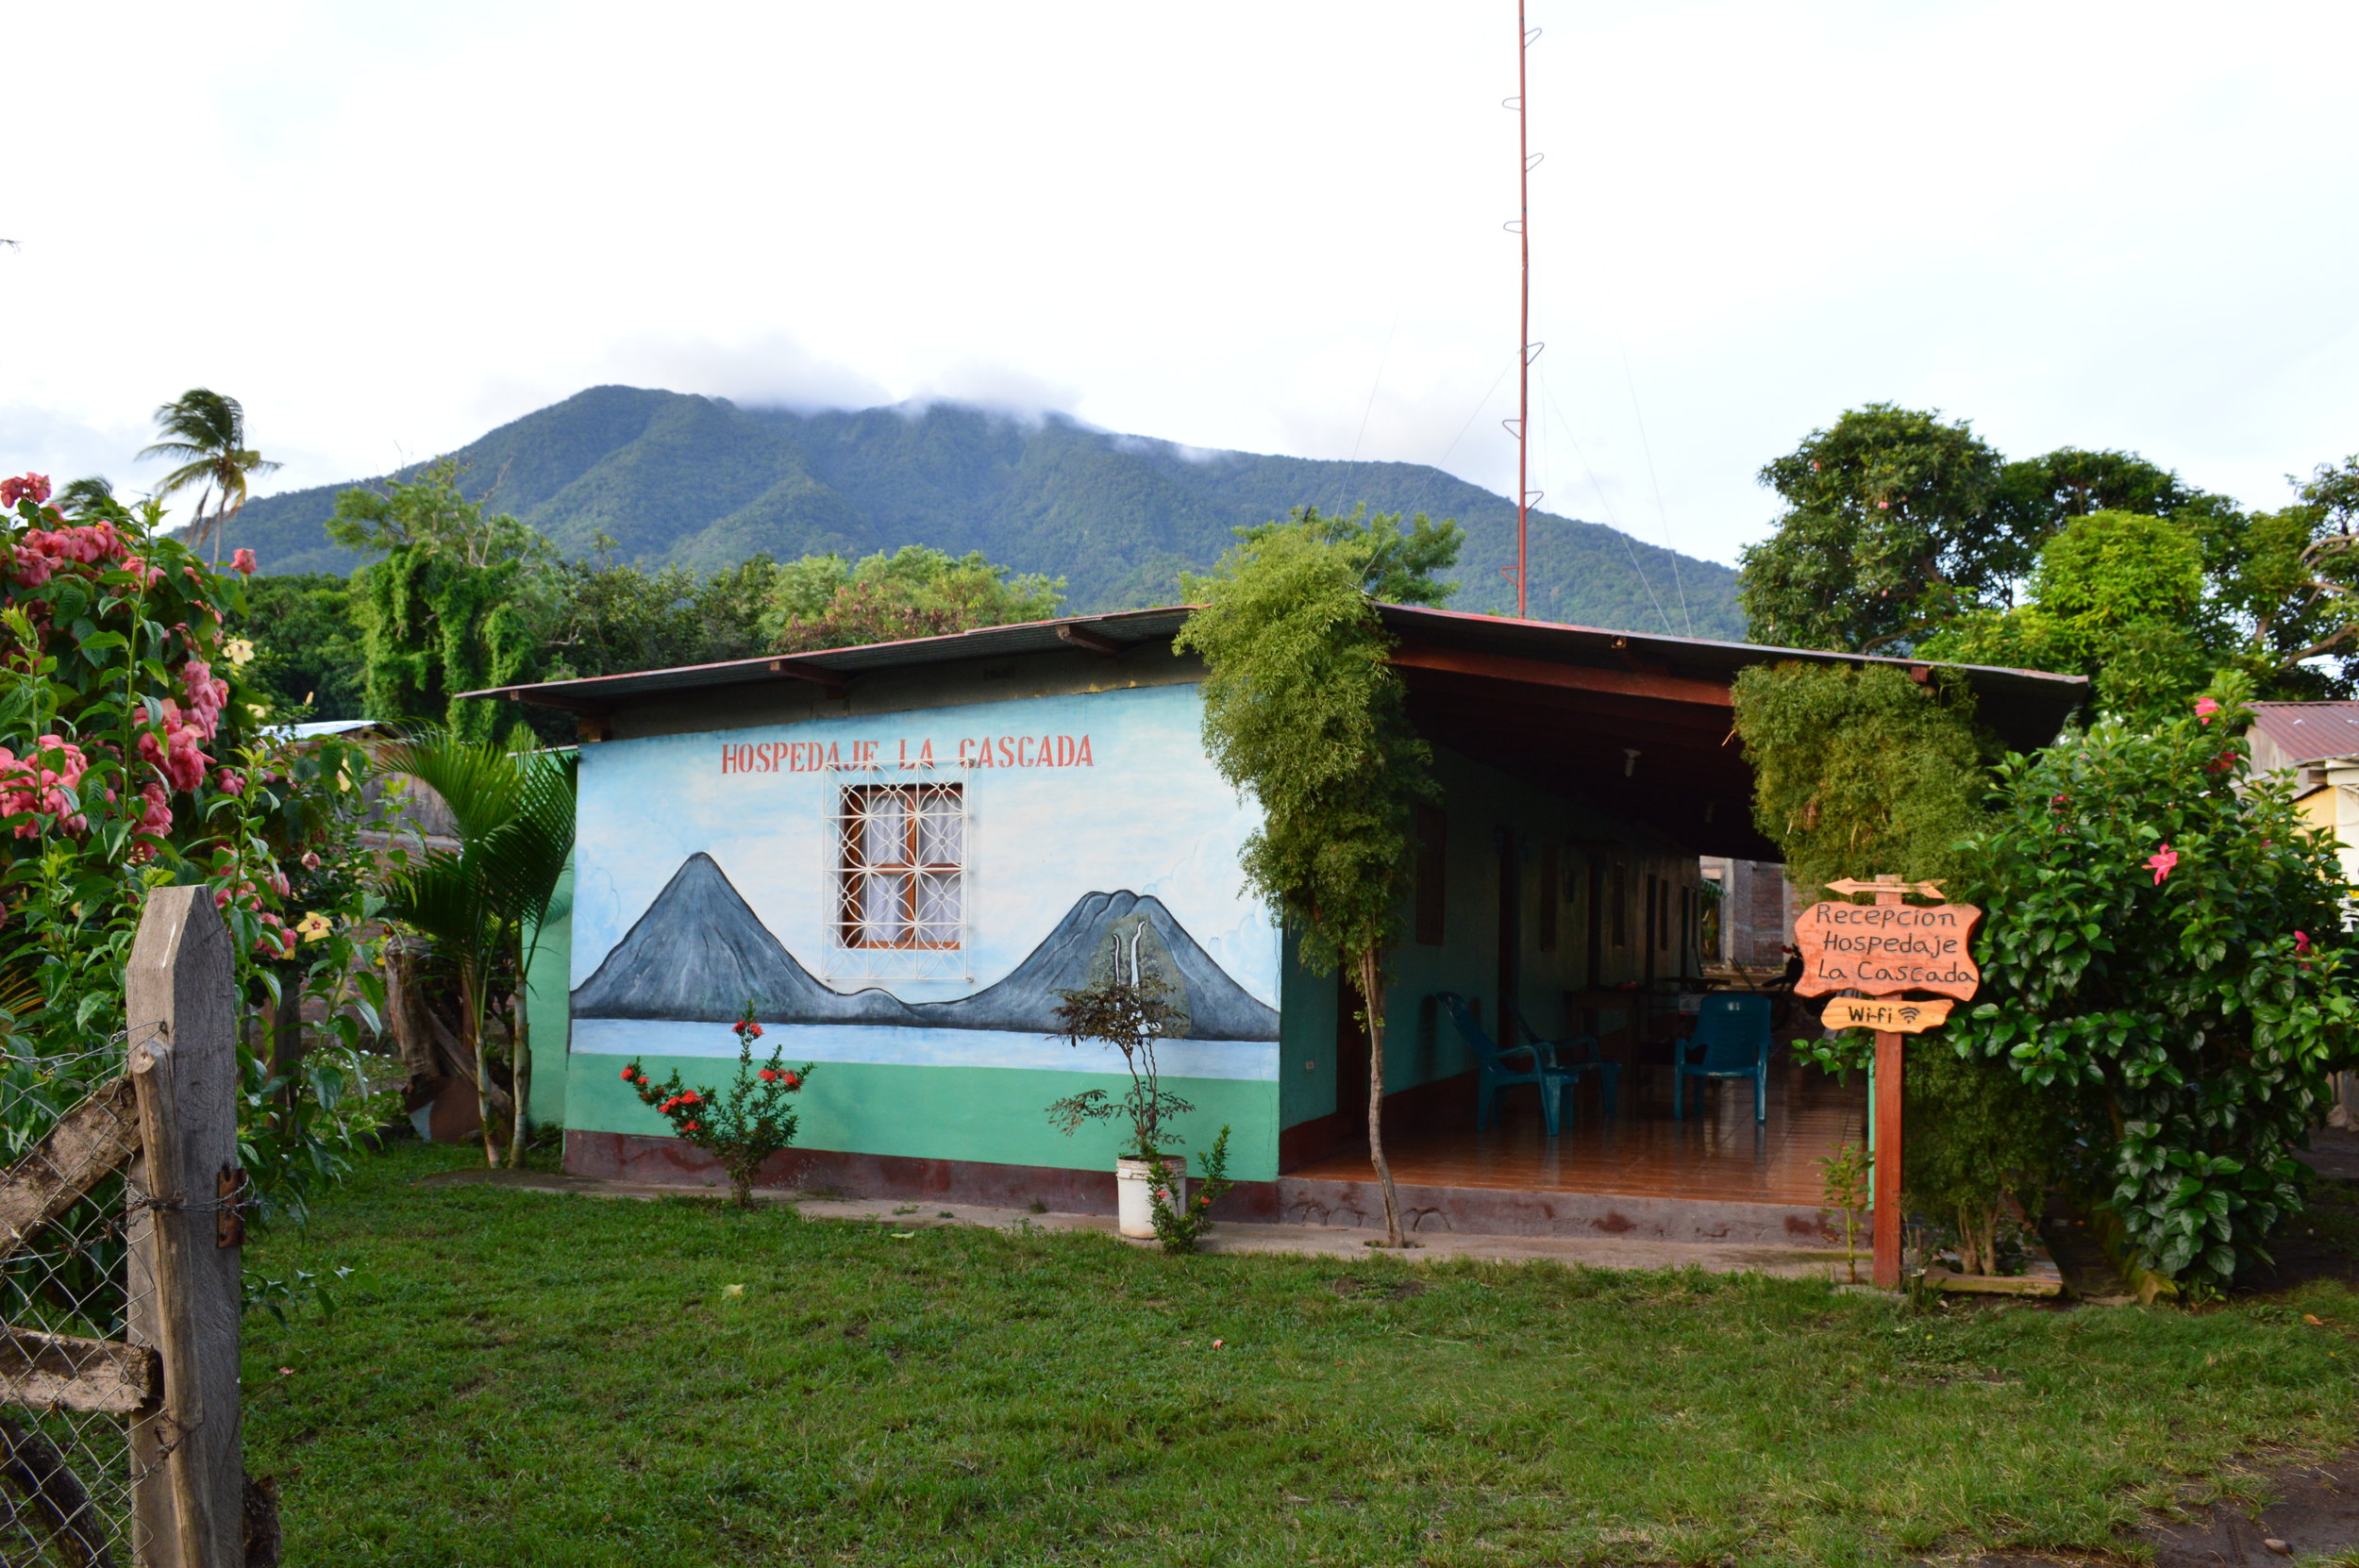 Hospedaje La Cascada (Hostel)